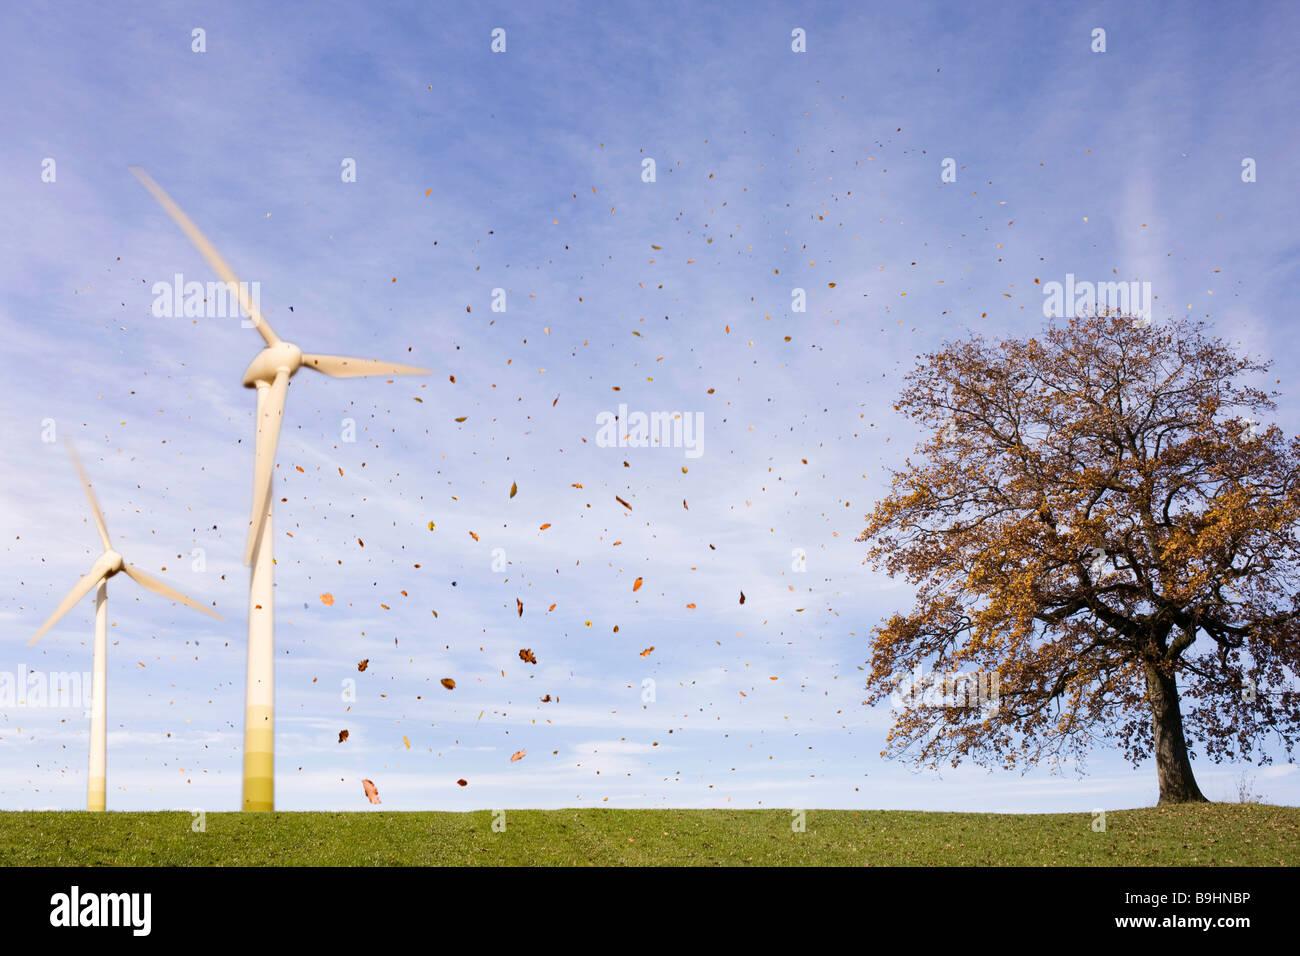 Fallende Blätter, Baum, Windkraftanlagen Stockfoto